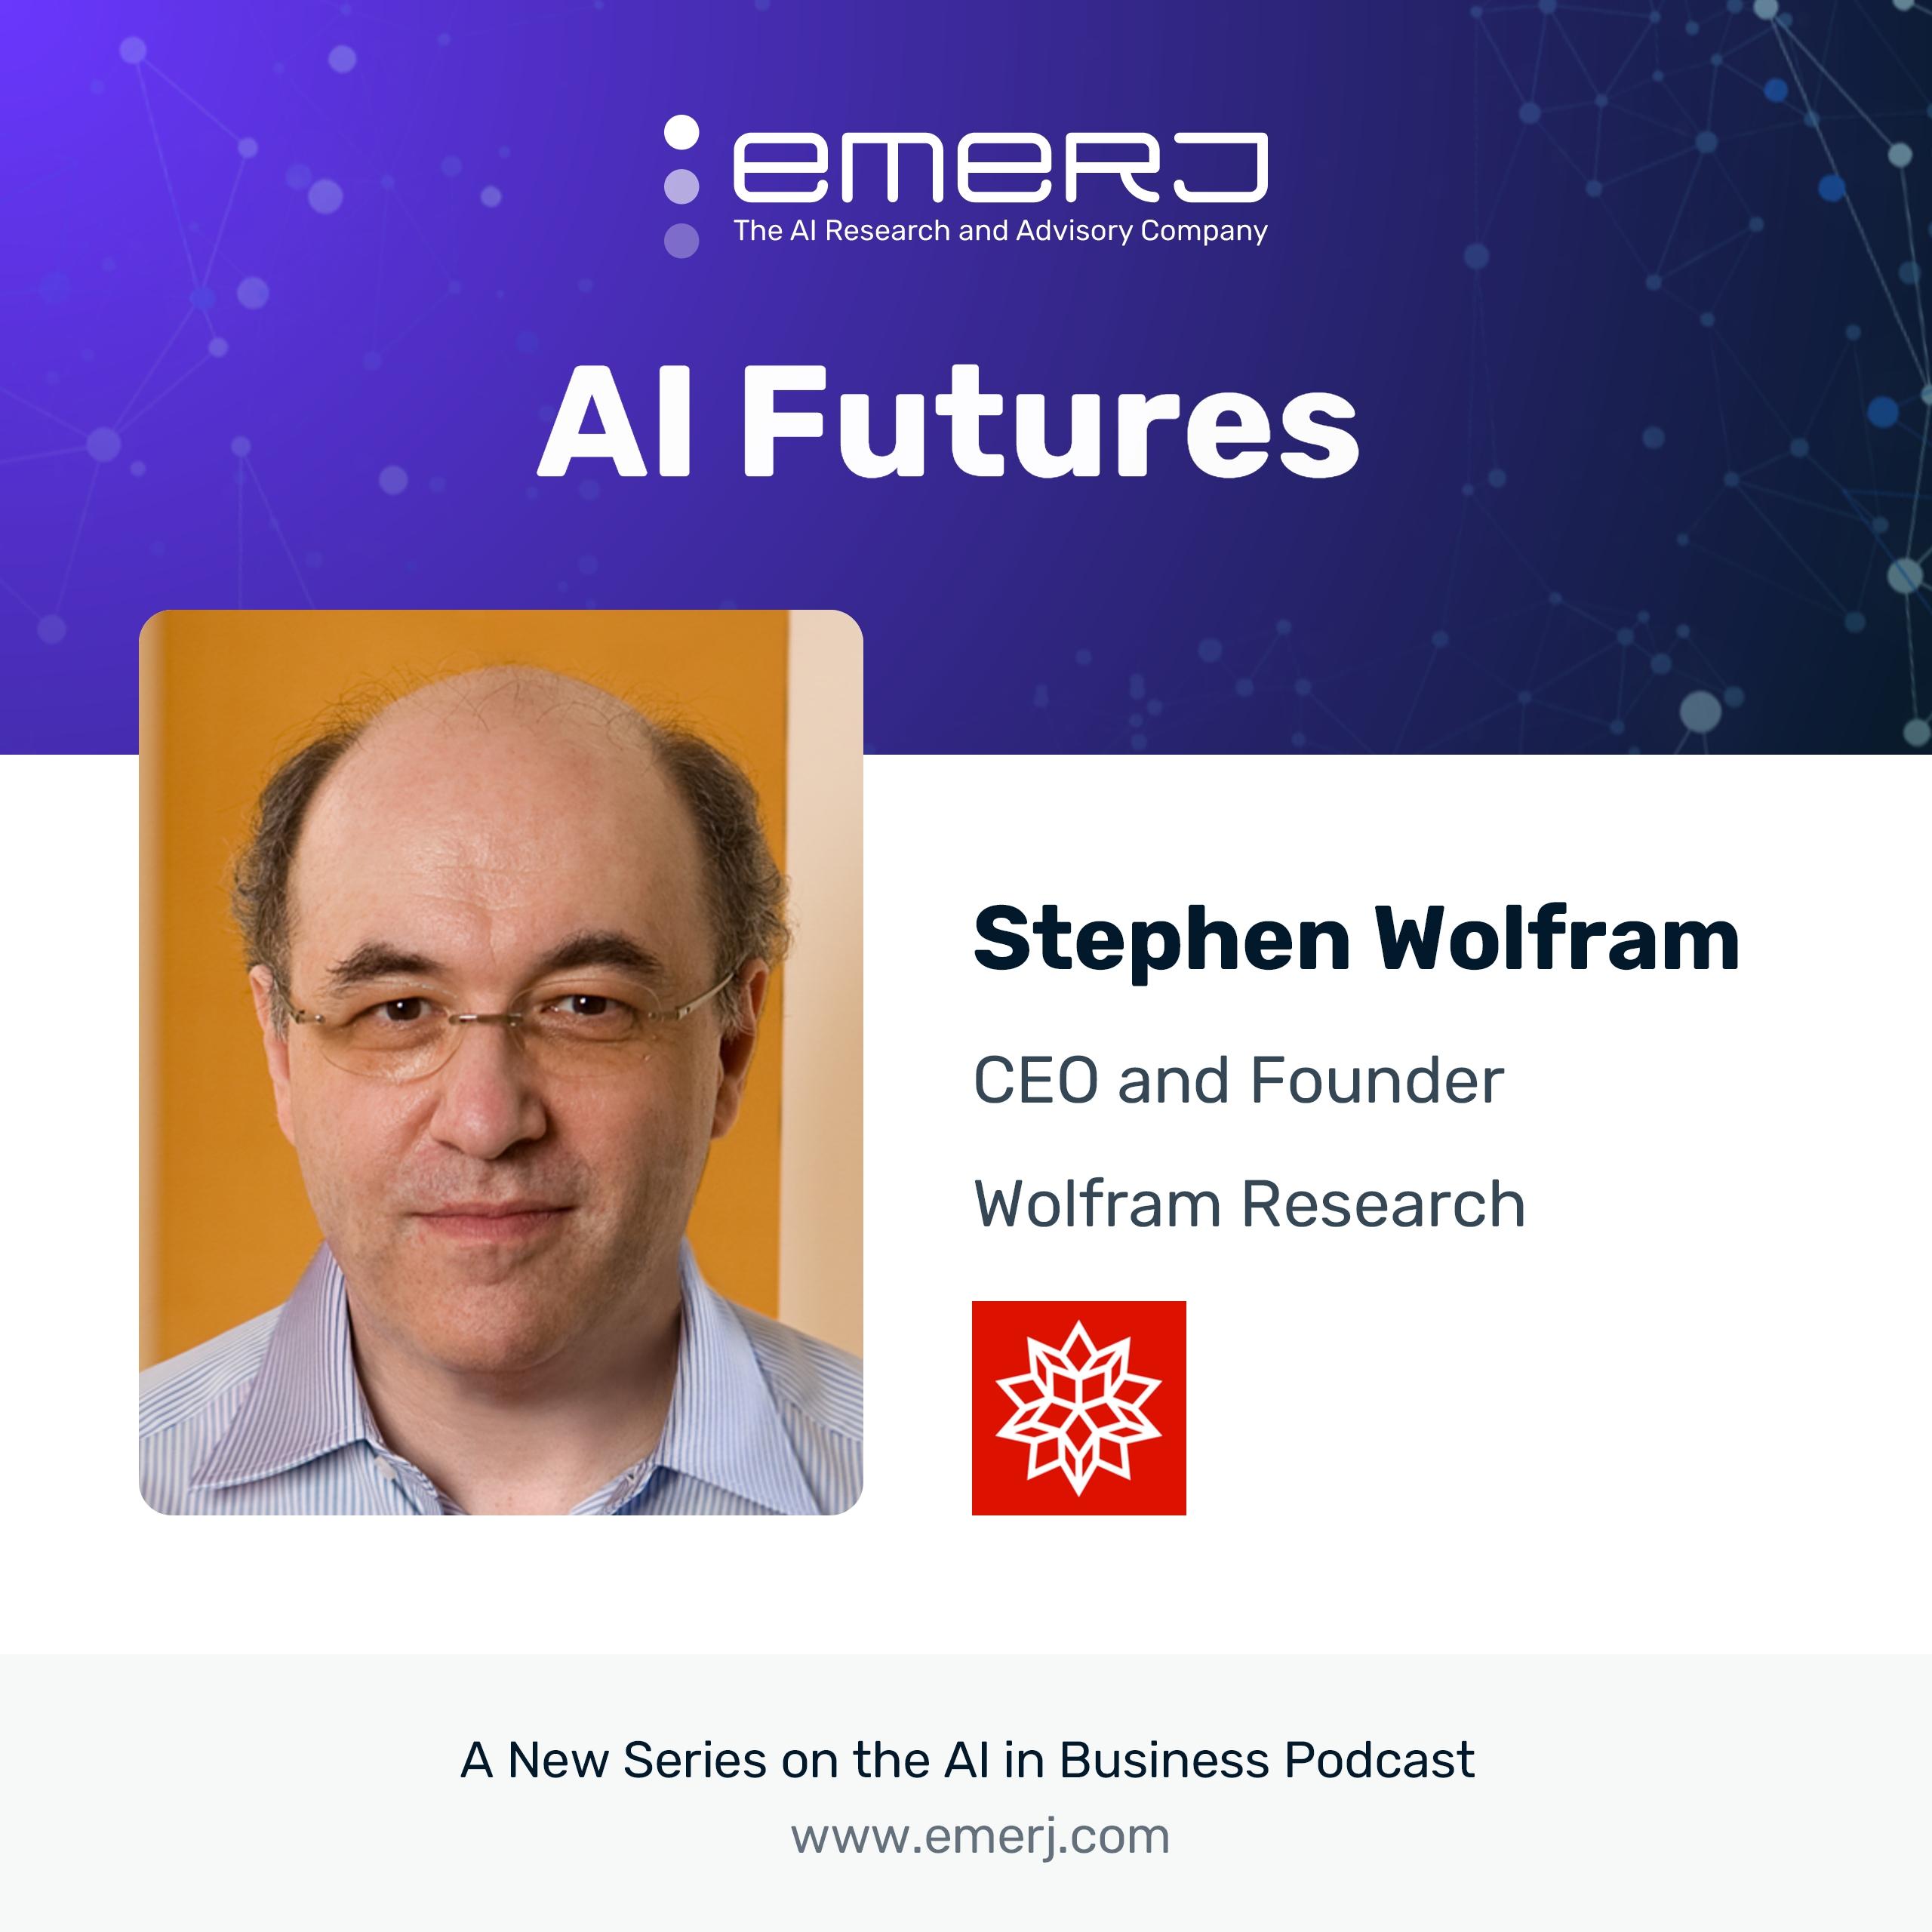 [AI Futures - S2E1] Stephen Wolfram on the Future Impact of AI on Everyday Life